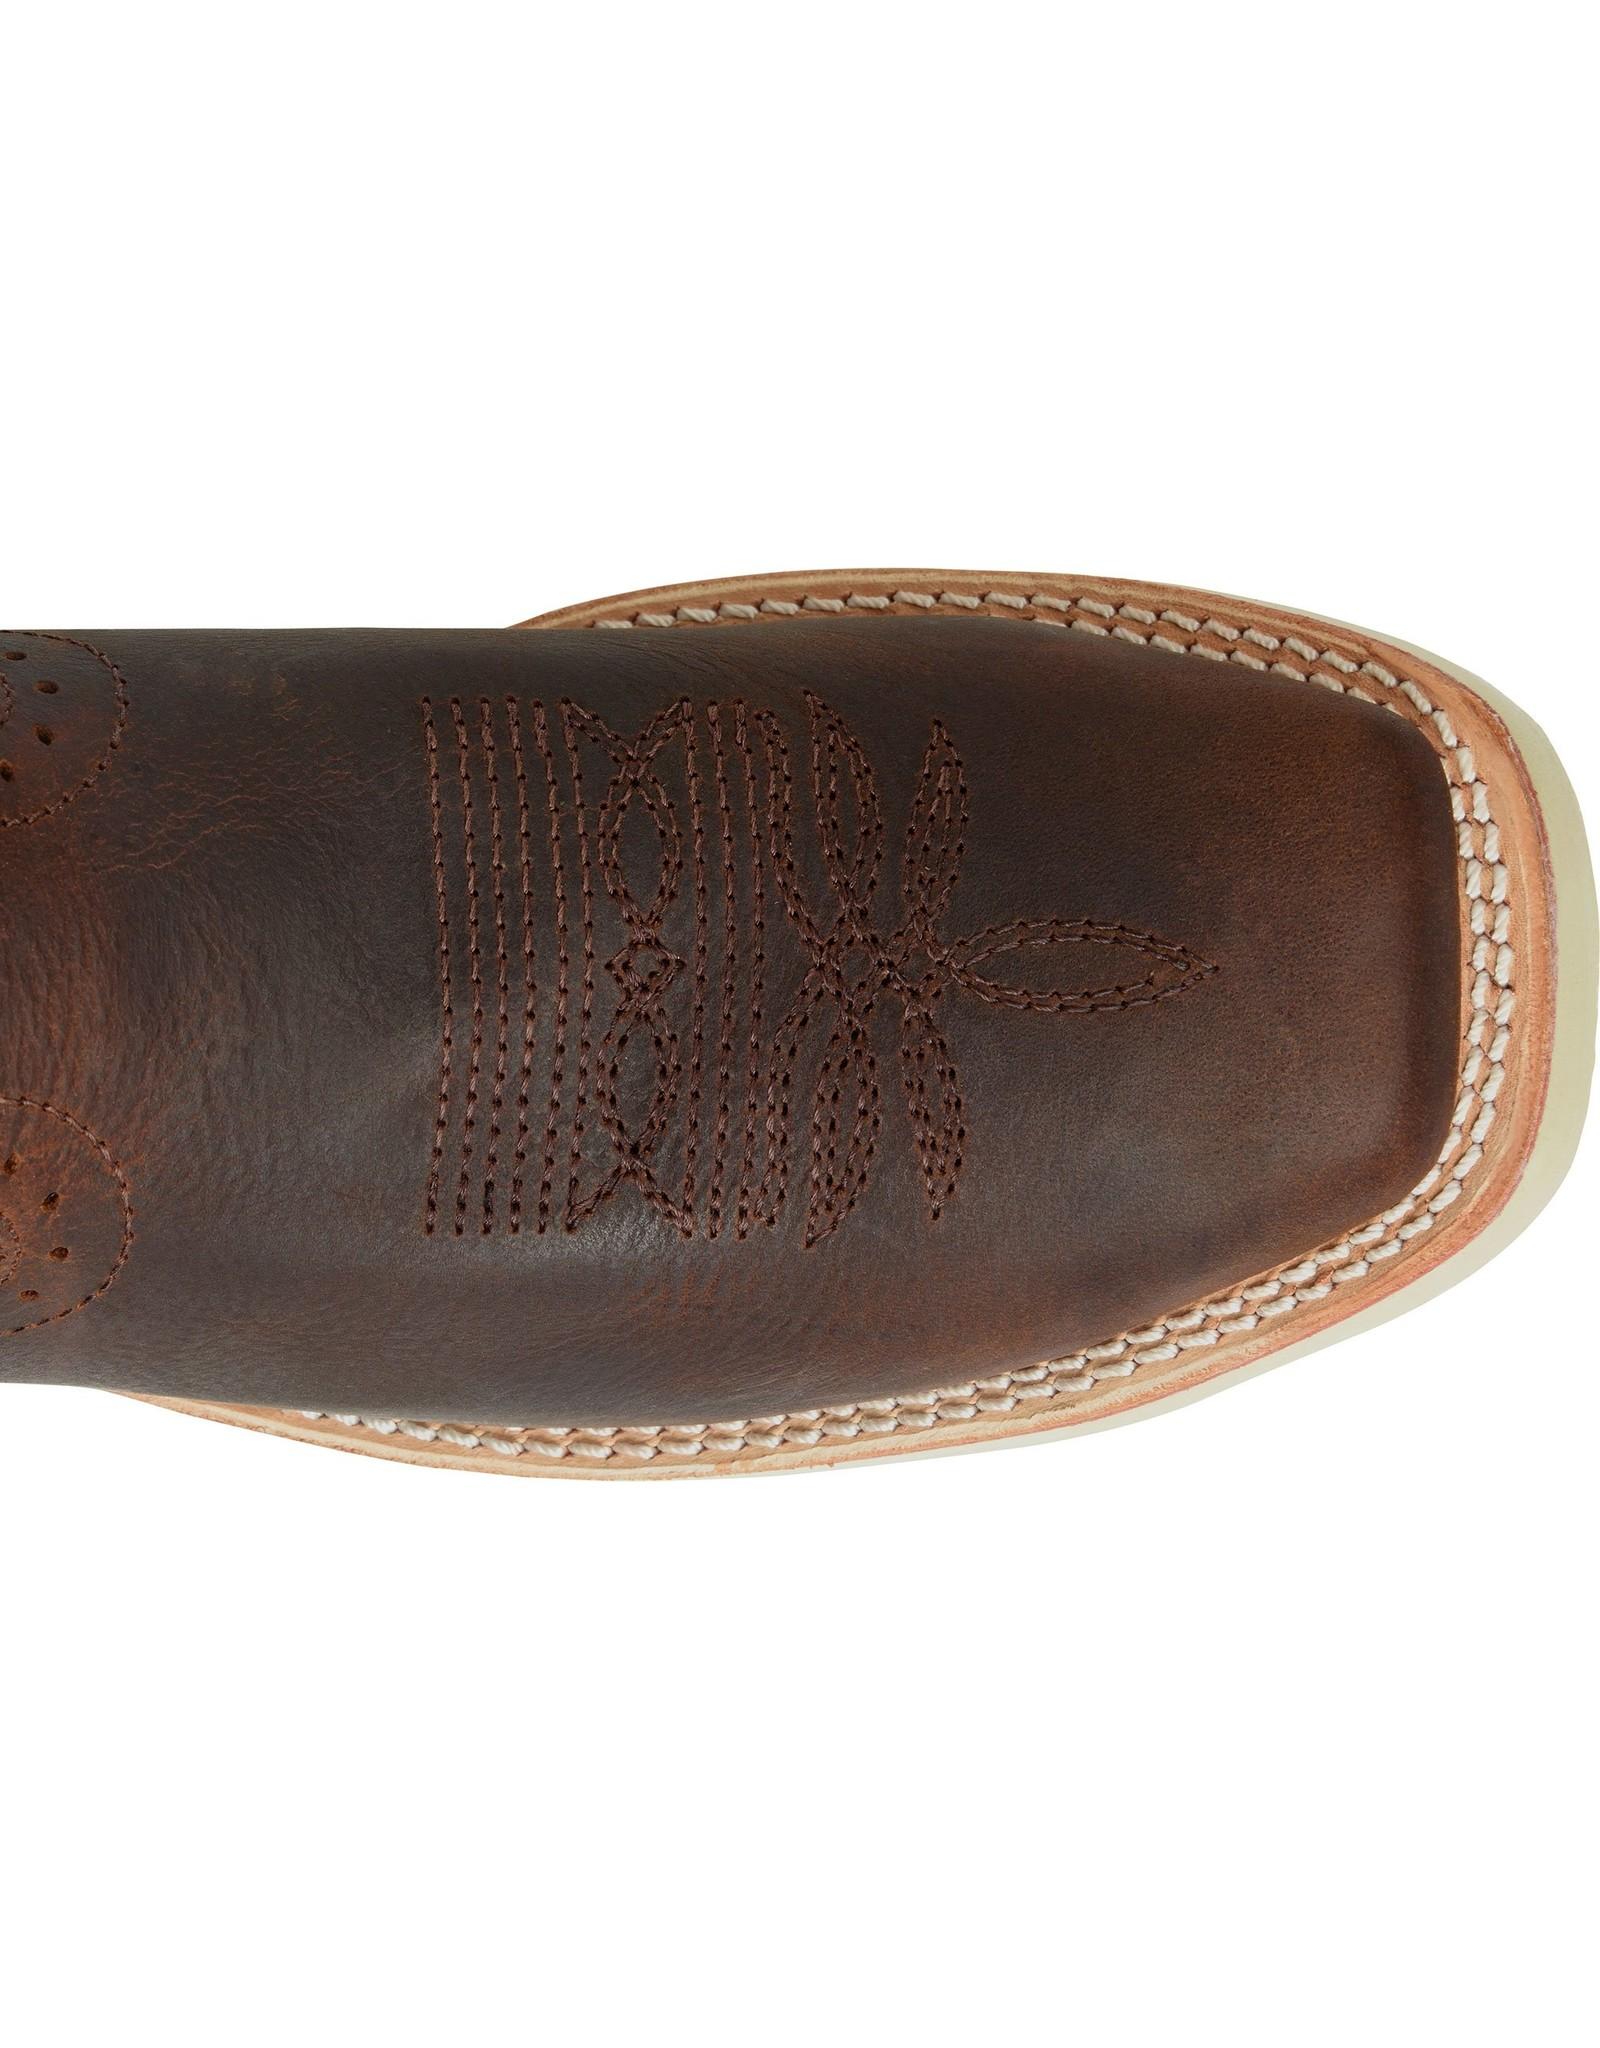 Boots-Men DOUBLE H DH4649 Wooten